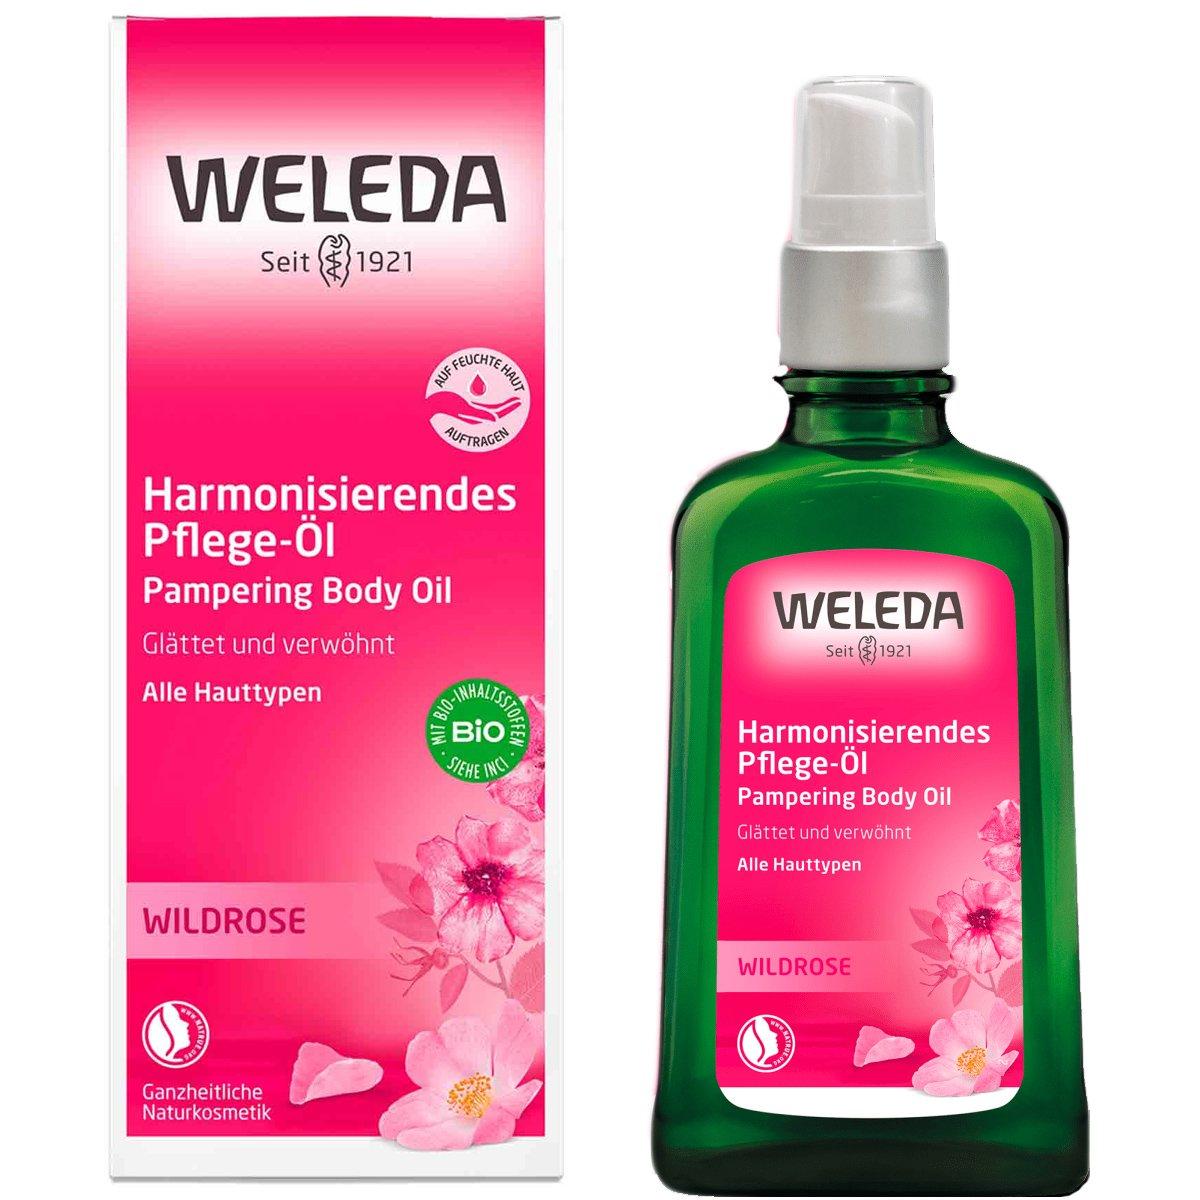 Weleda Wild Rose Pampering Body Oil Λάδι Σώματος Άγριου Τριαντάφυλλου για Εντατική Πλούσια Θρέψη 100ml